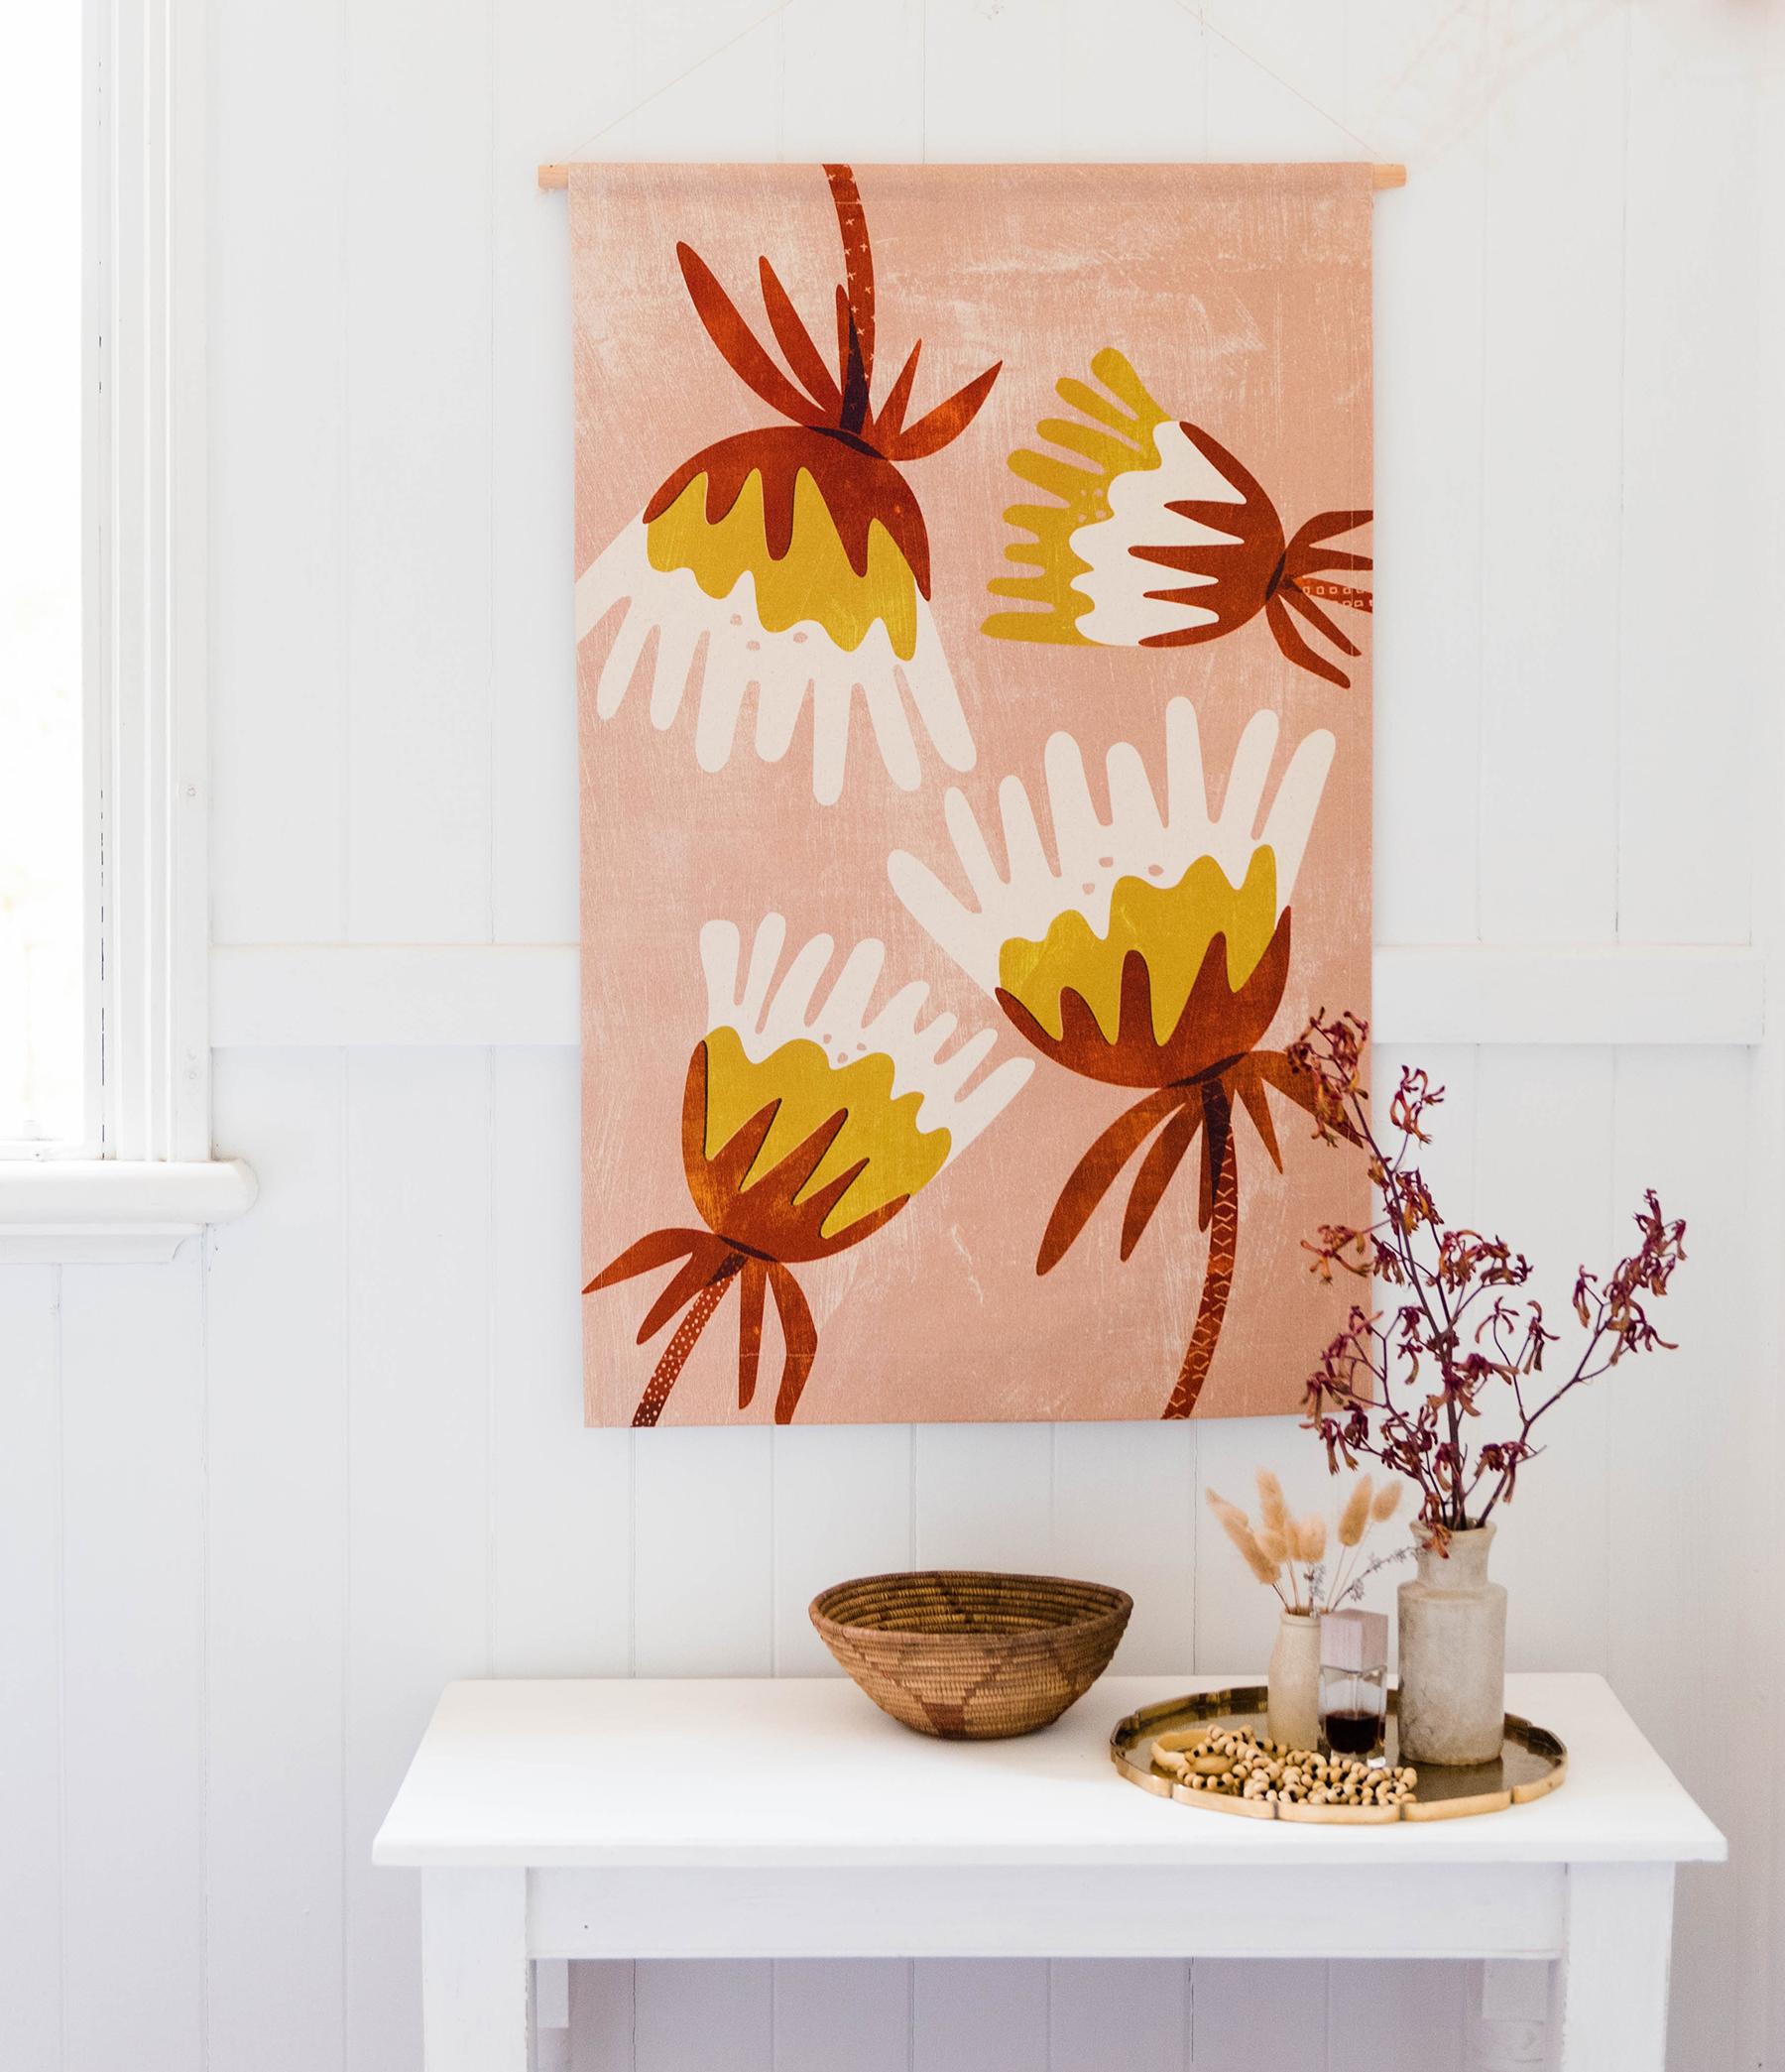 Blush Fuchsia midi wall hanging from Home Dweller  / Photography: Hannah Puechmarin / Styling: Cheryl Car, Albert & Grace